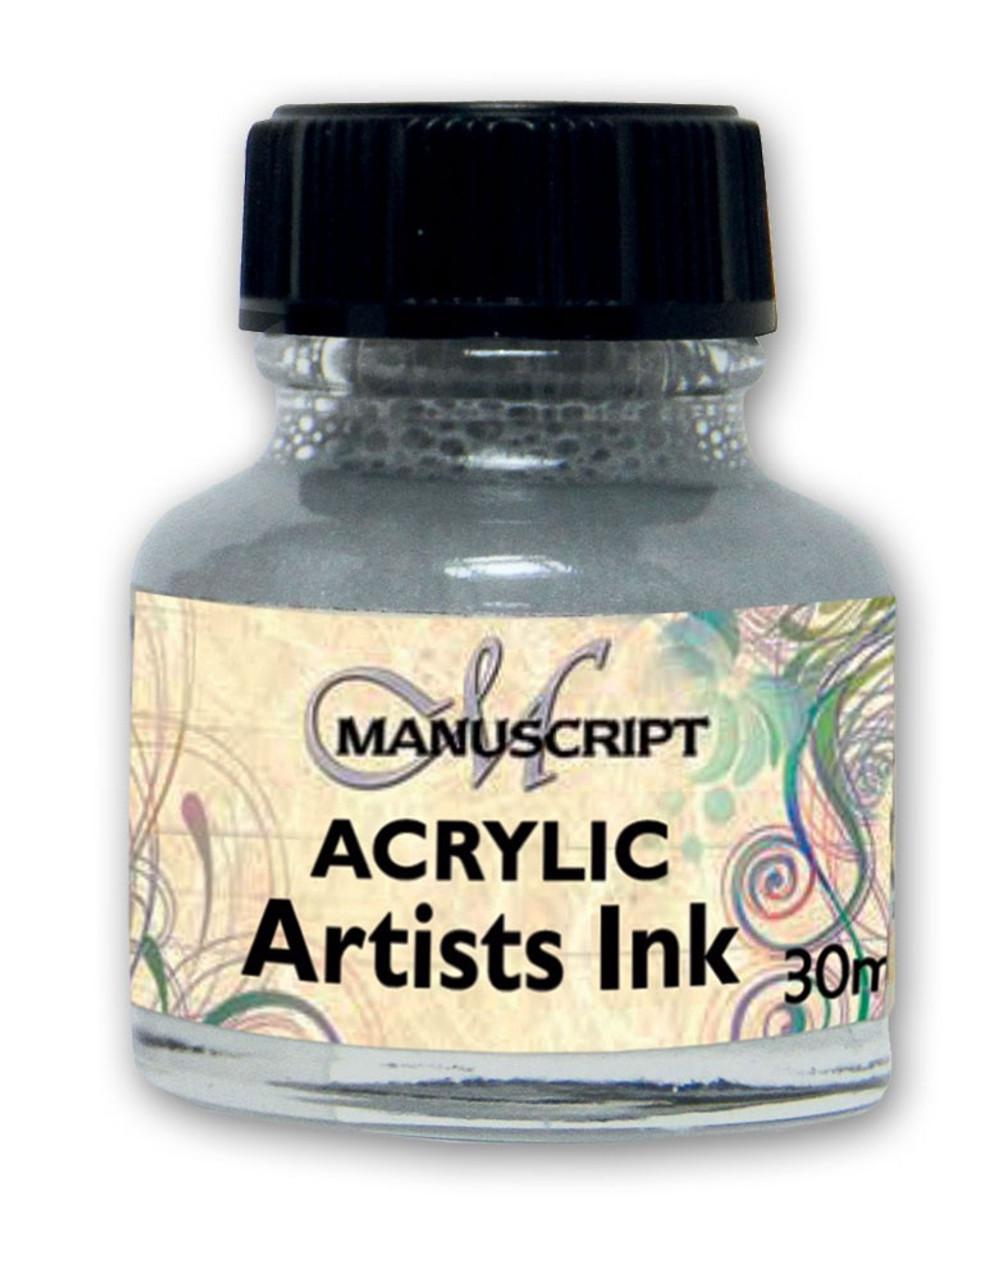 Manuscript 30ml Metallic Silver Artists Acrylic Ink Bottle